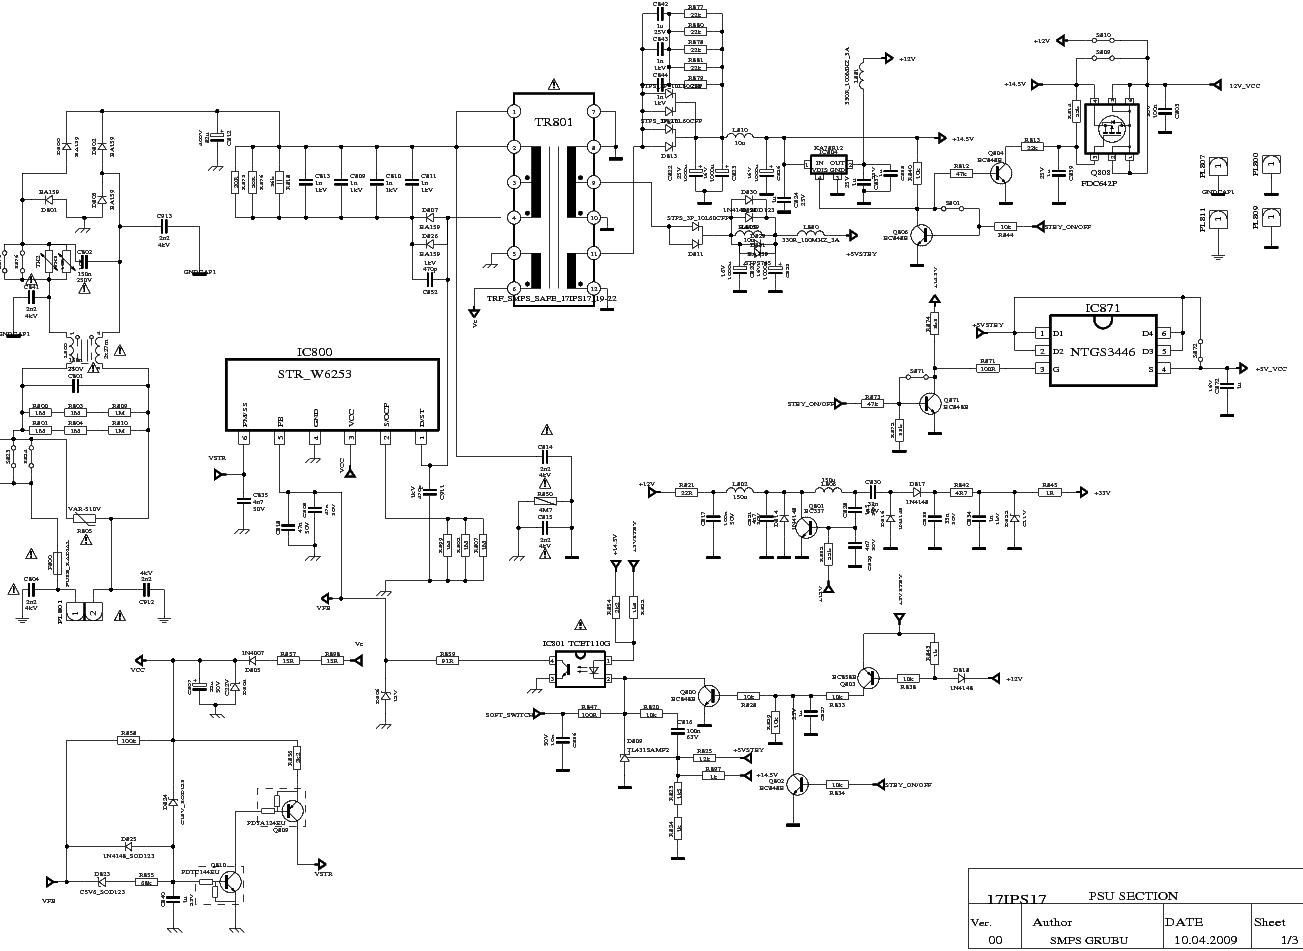 Vestel 17ips17 Power Supply Sch Service Manual Download  Schematics  Eeprom  Repair Info For